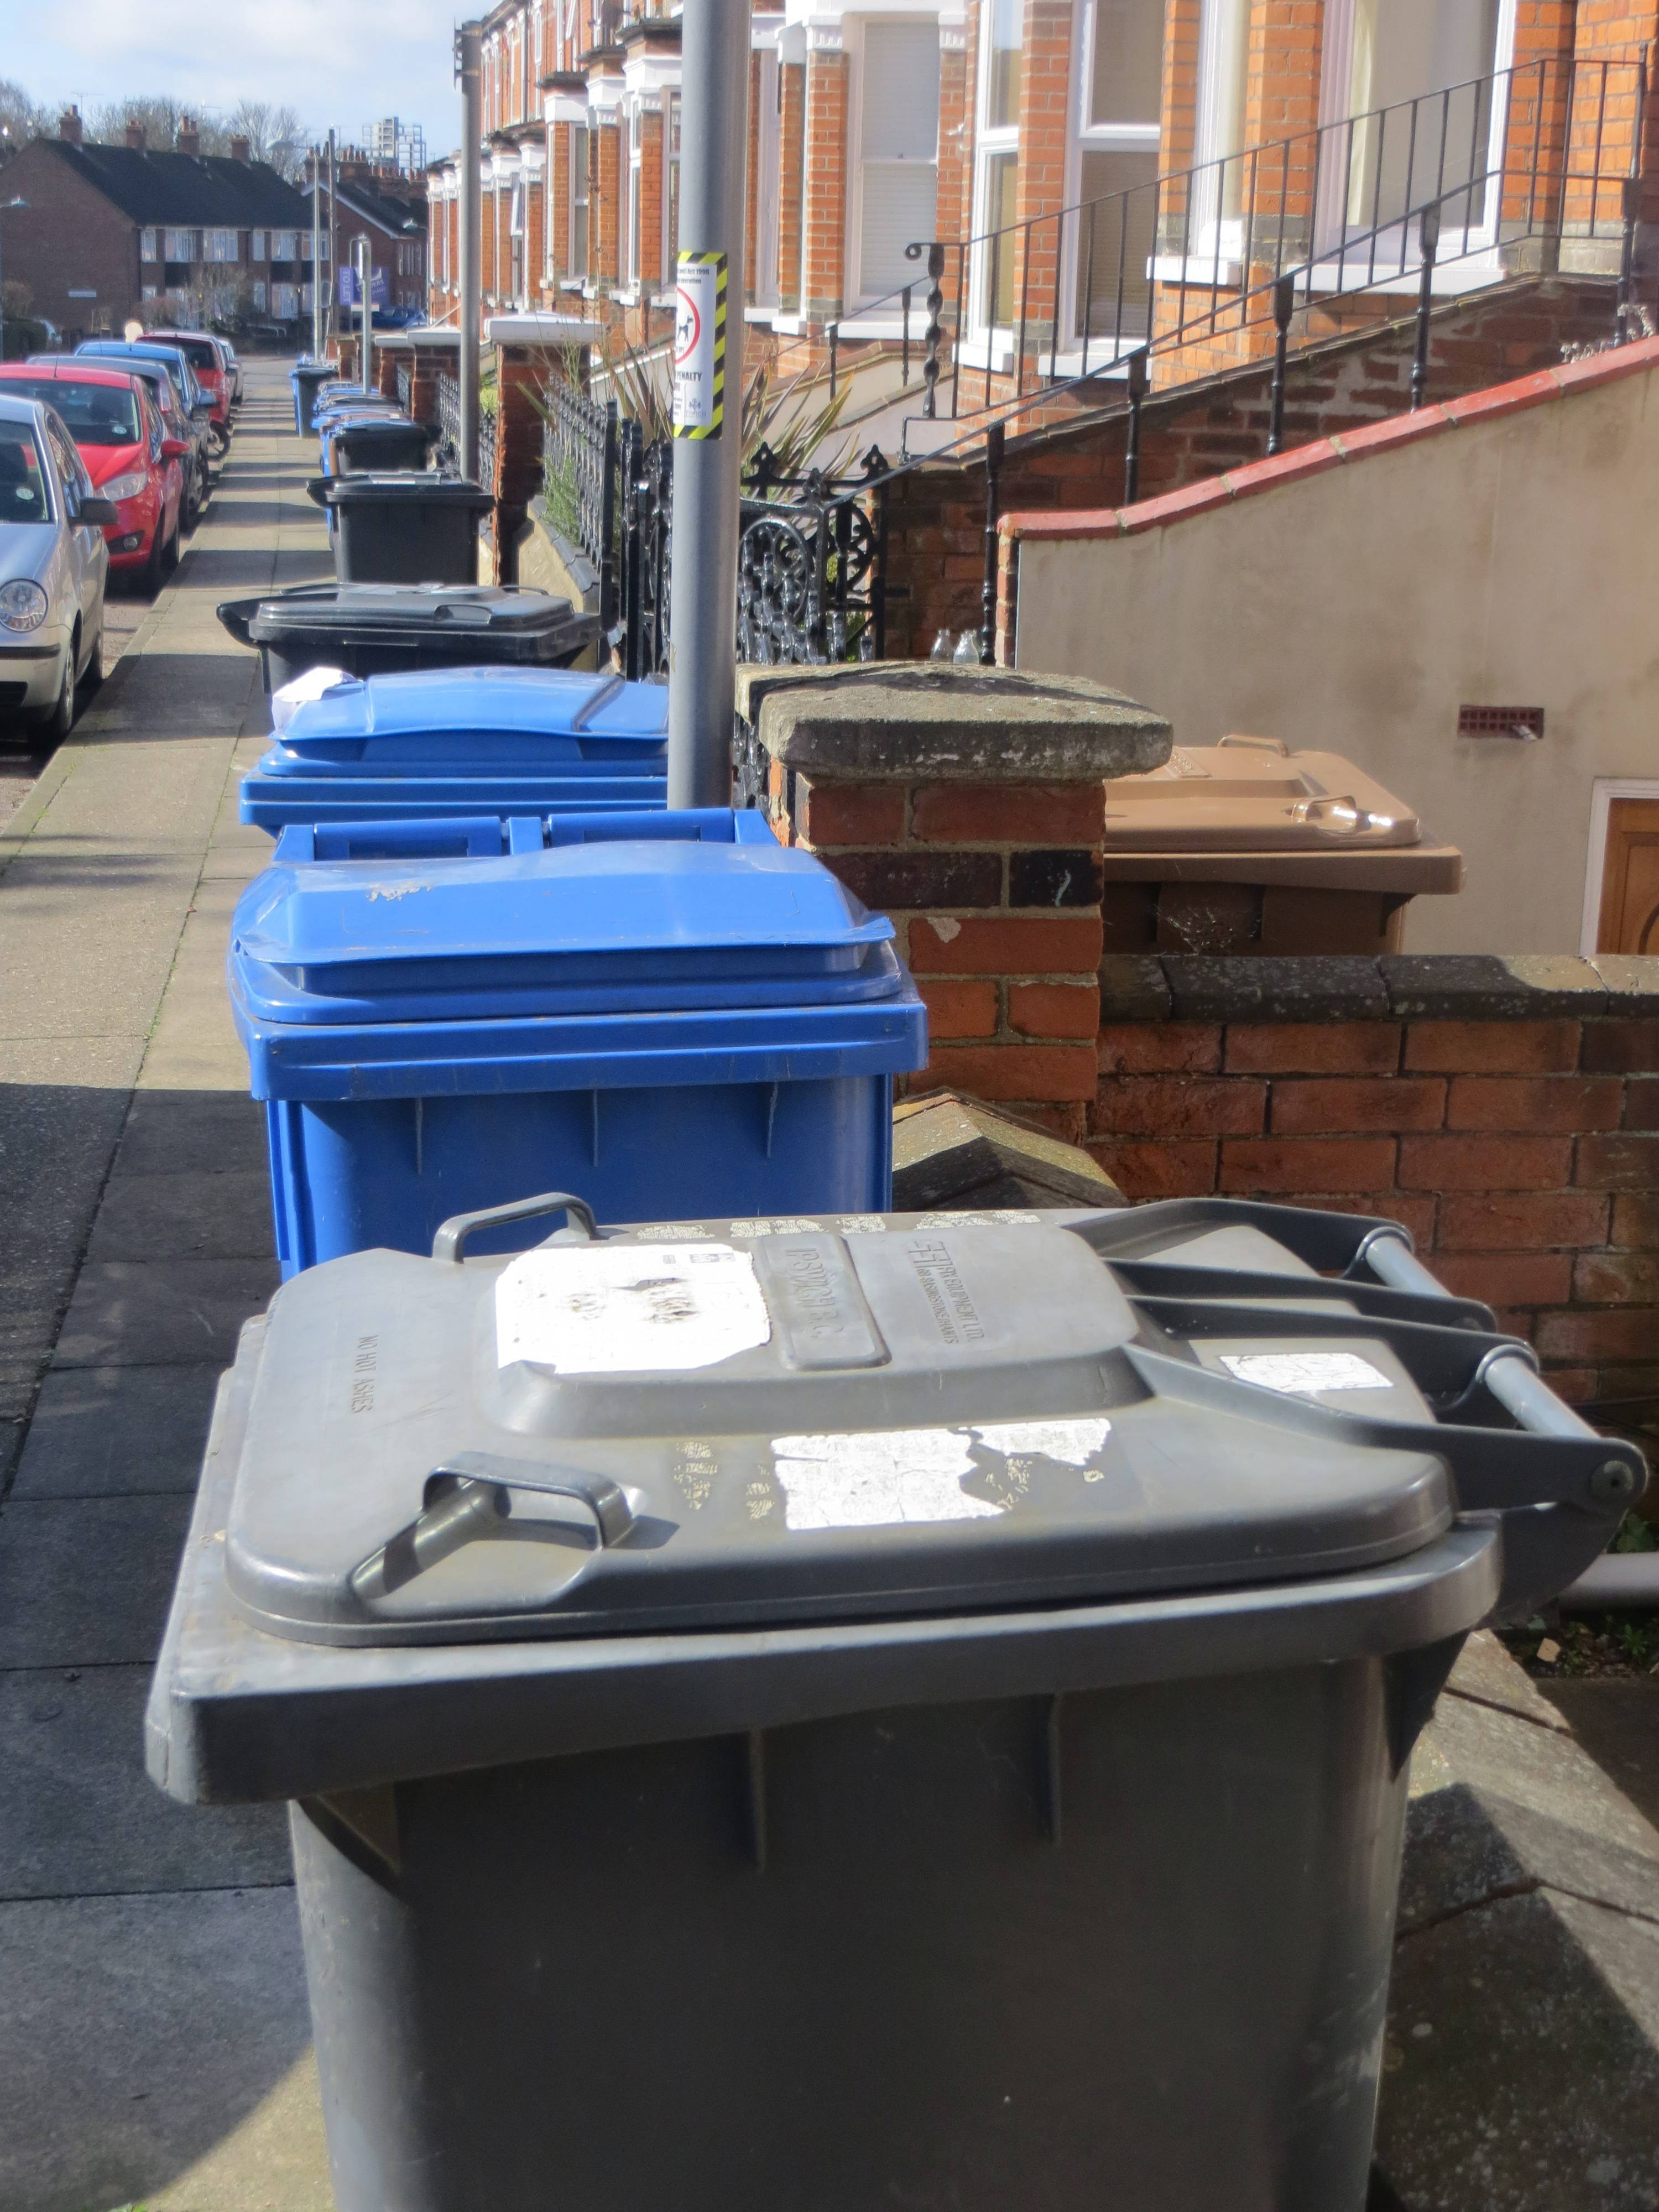 ipswich the bins